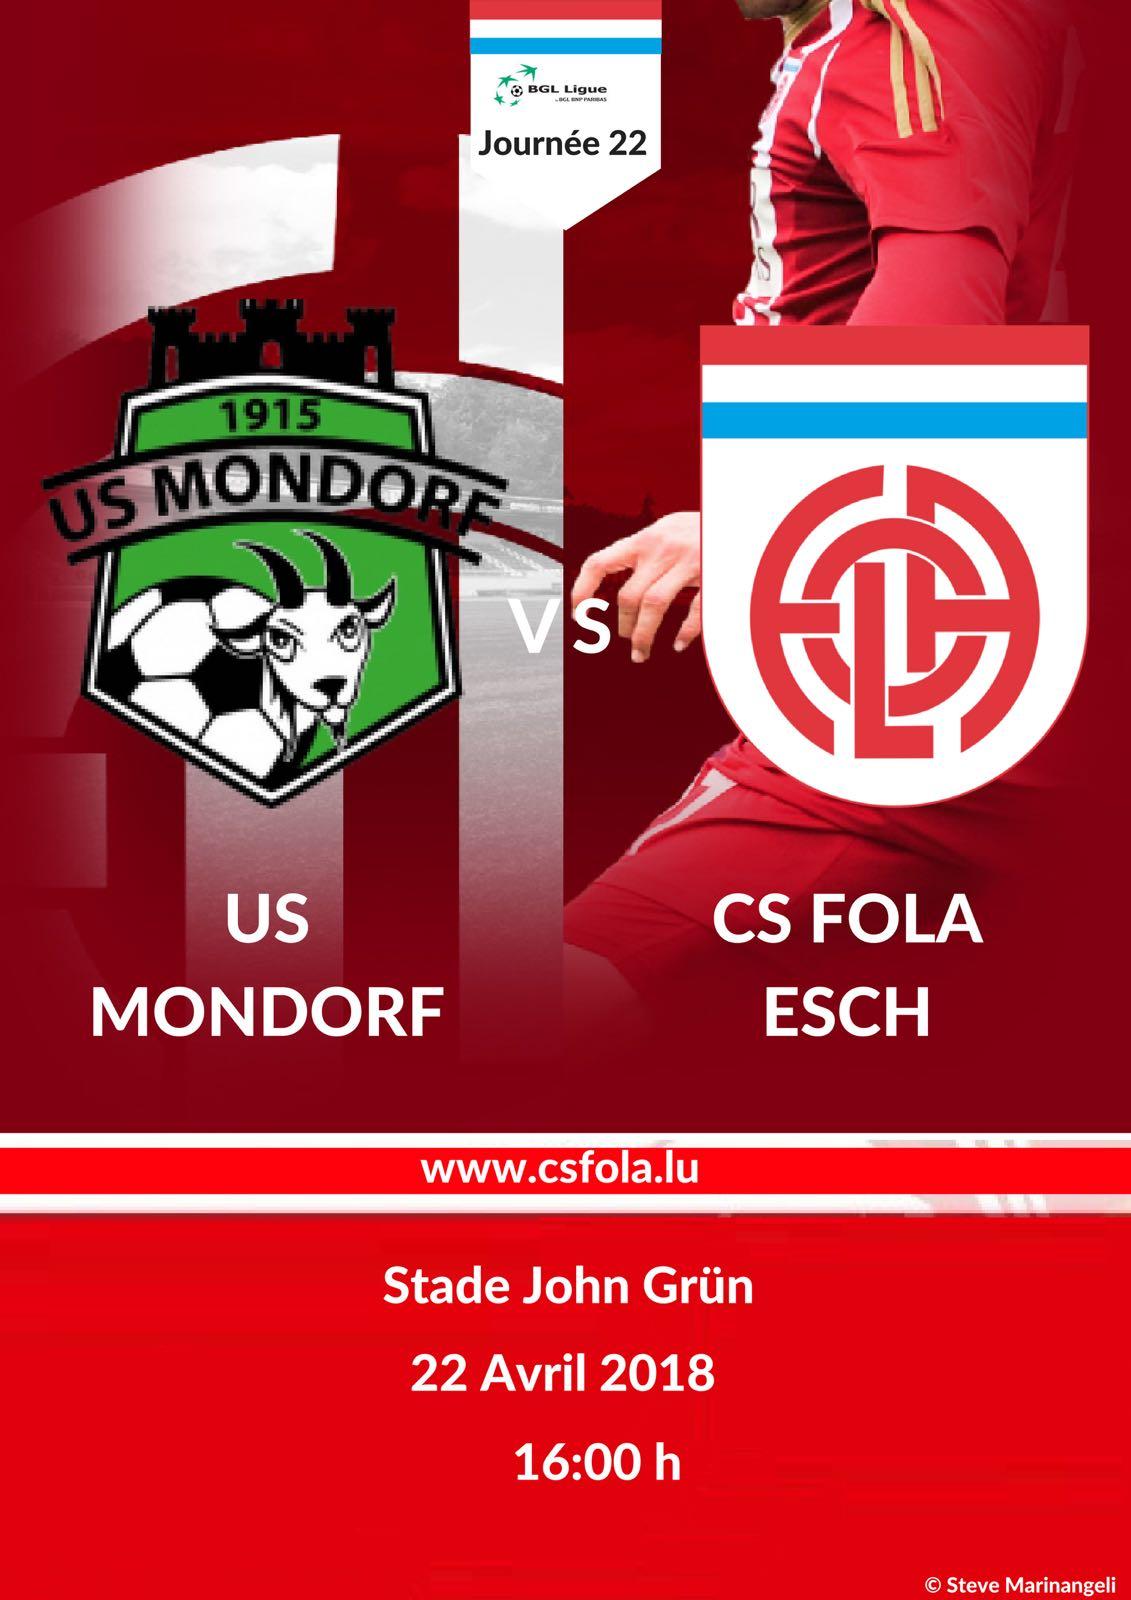 US Mondorf vs CS FOLA